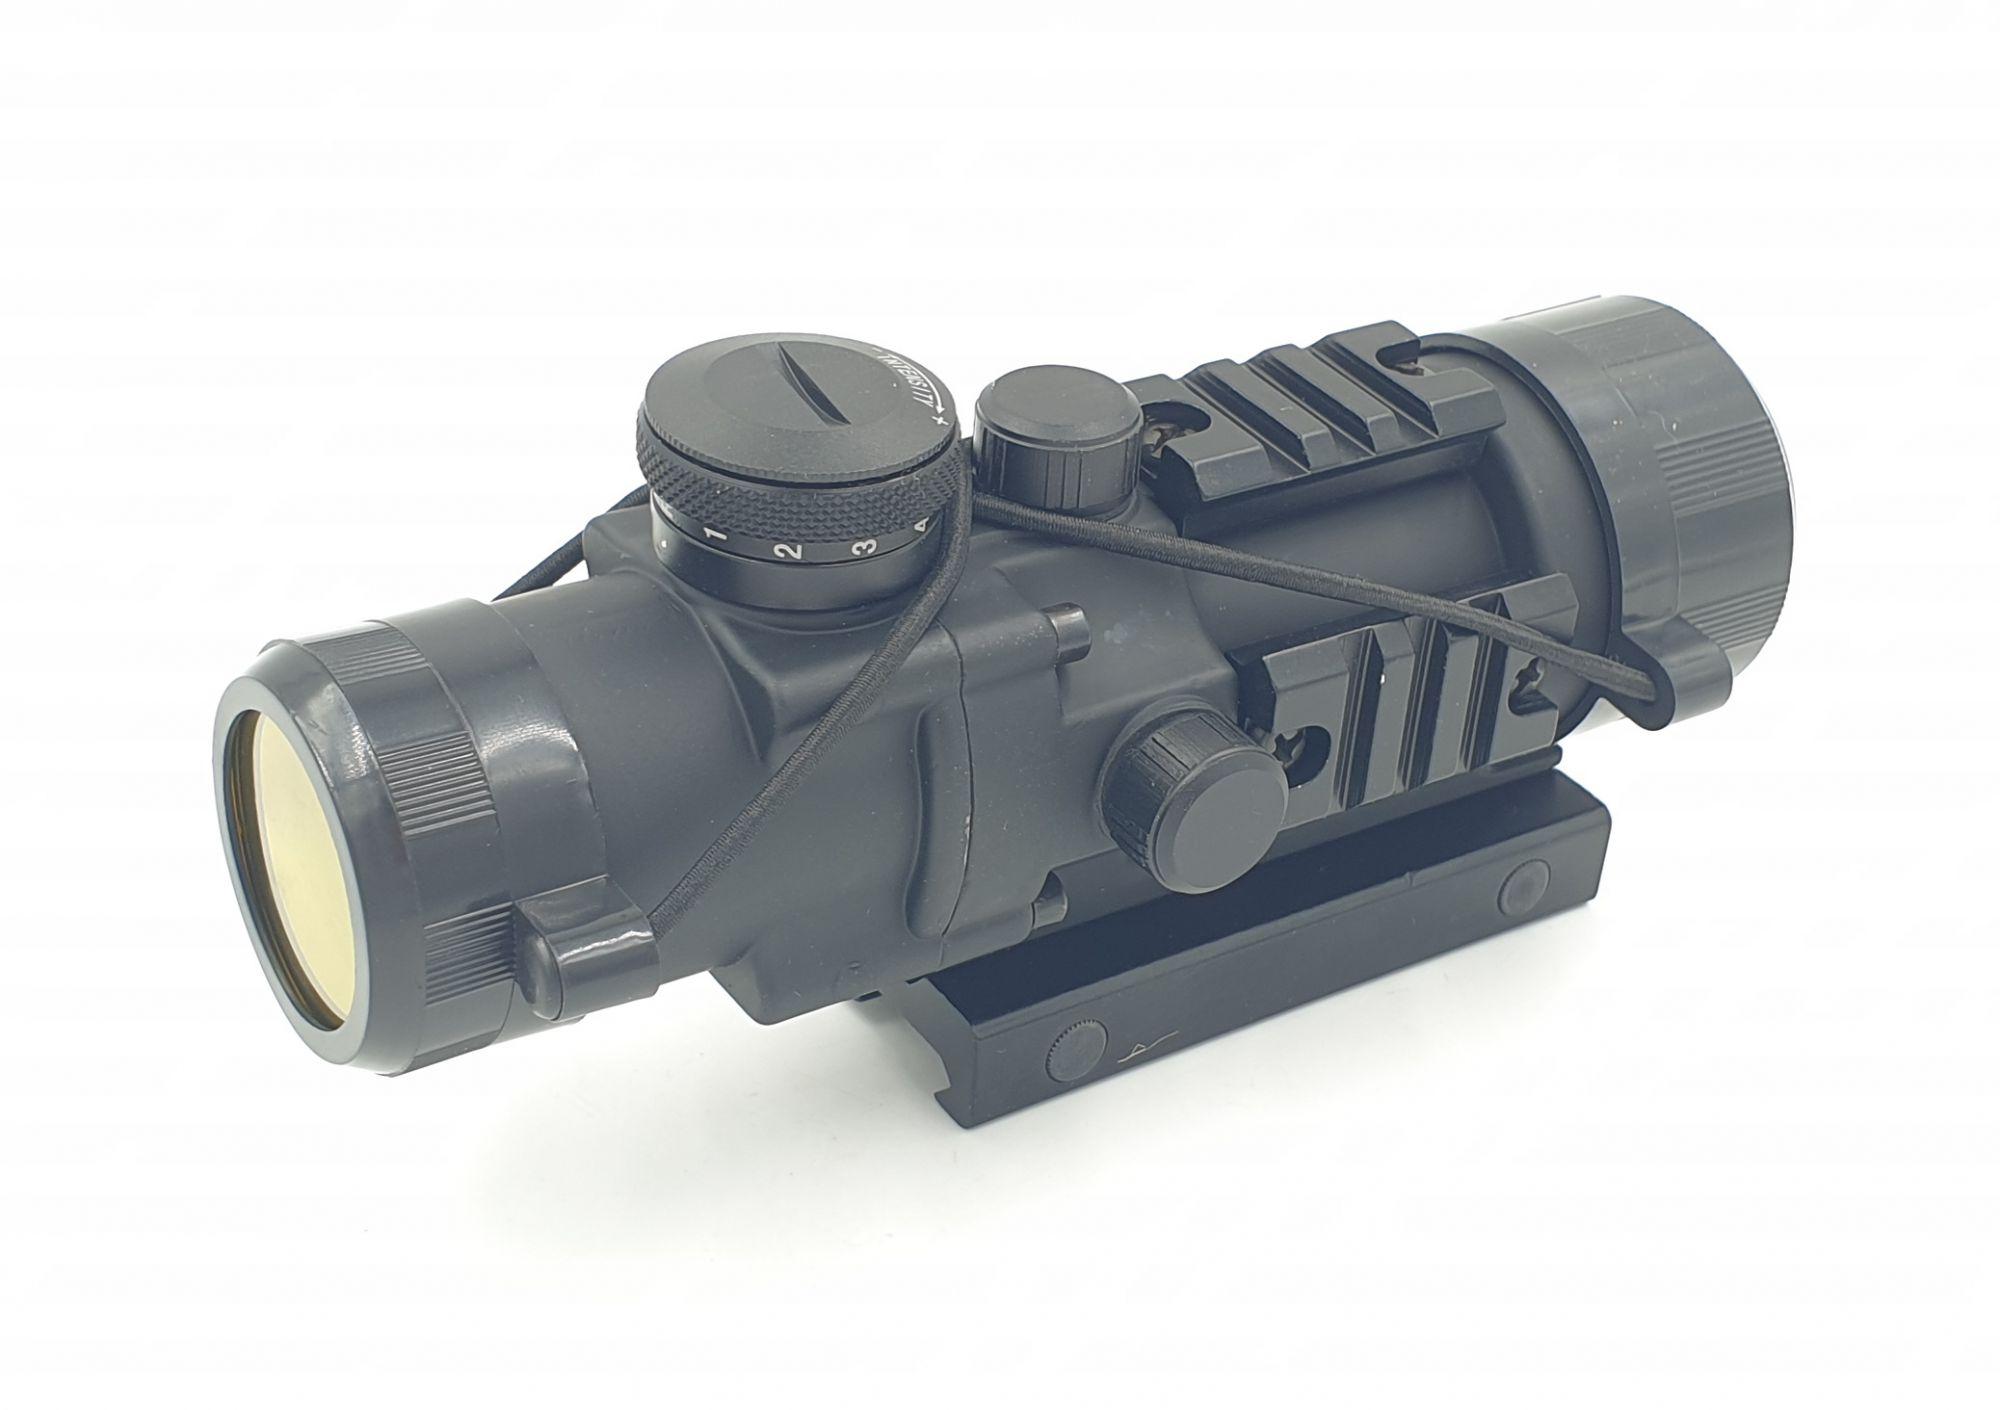 LUNETTE DE VISEE 4x32 IR - AIM-O